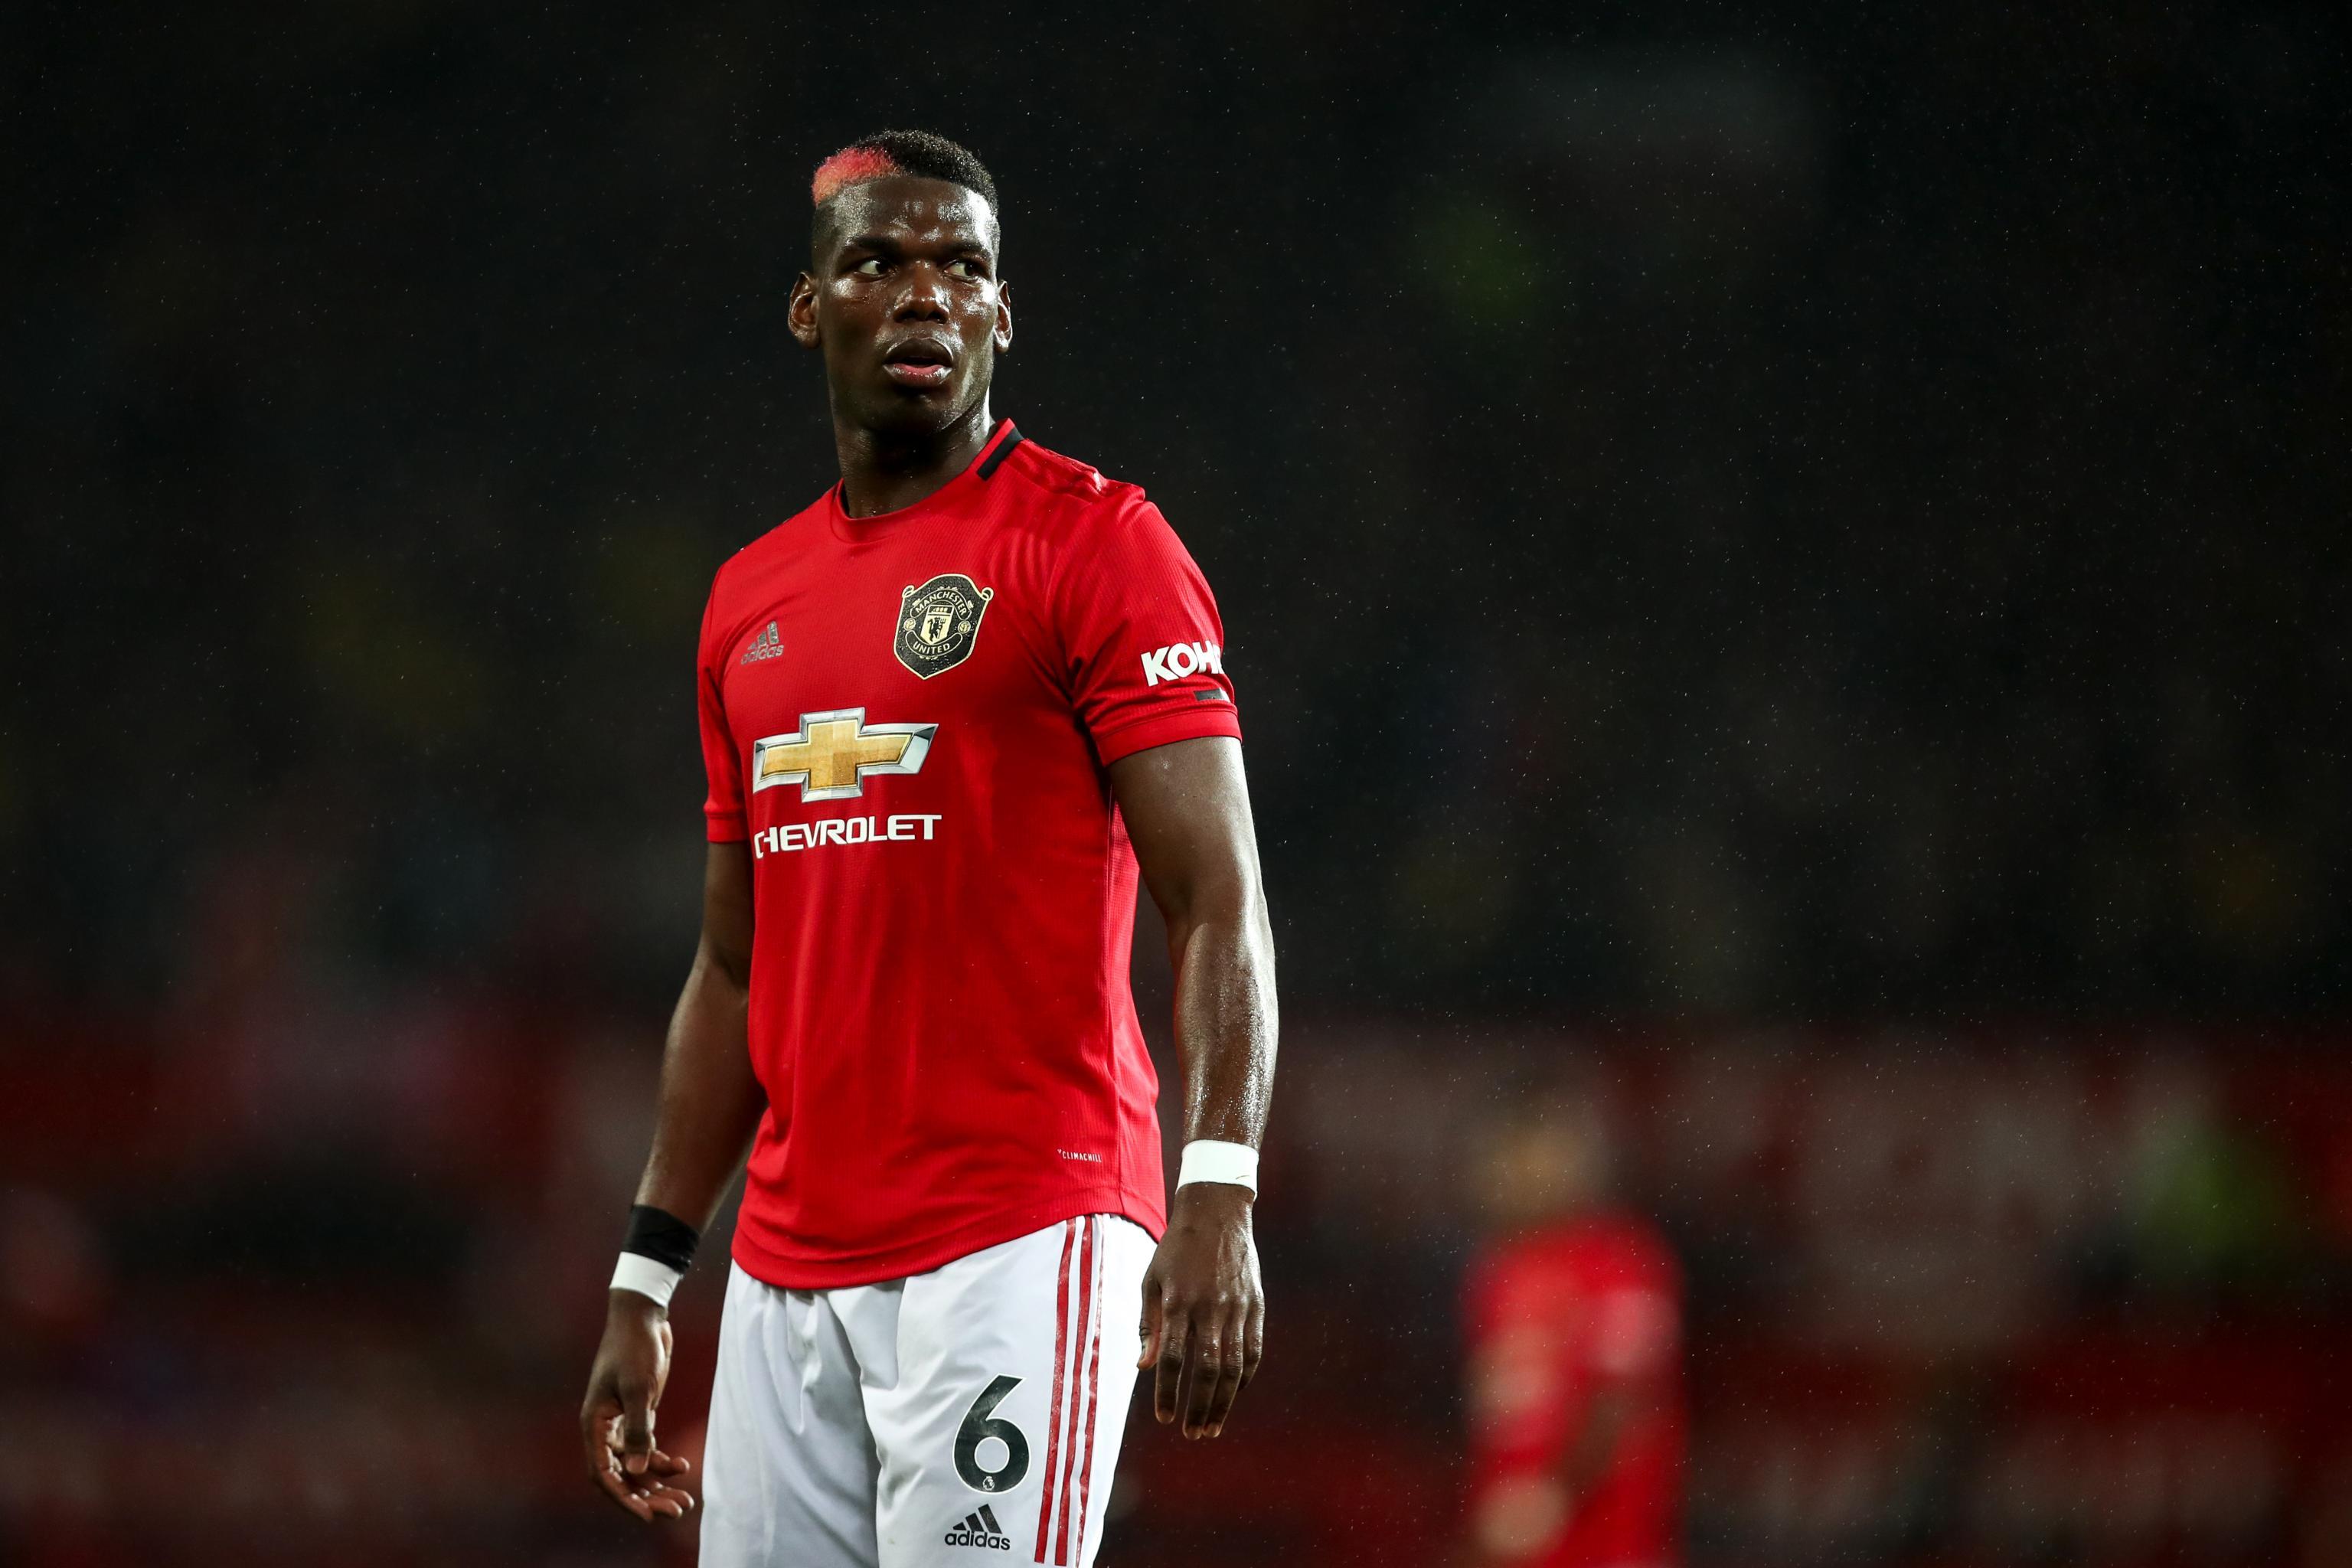 Paul Pogba Praises Manchester United Academy Ahead Of Landmark Everton Clash Bleacher Report Latest News Videos And Highlights